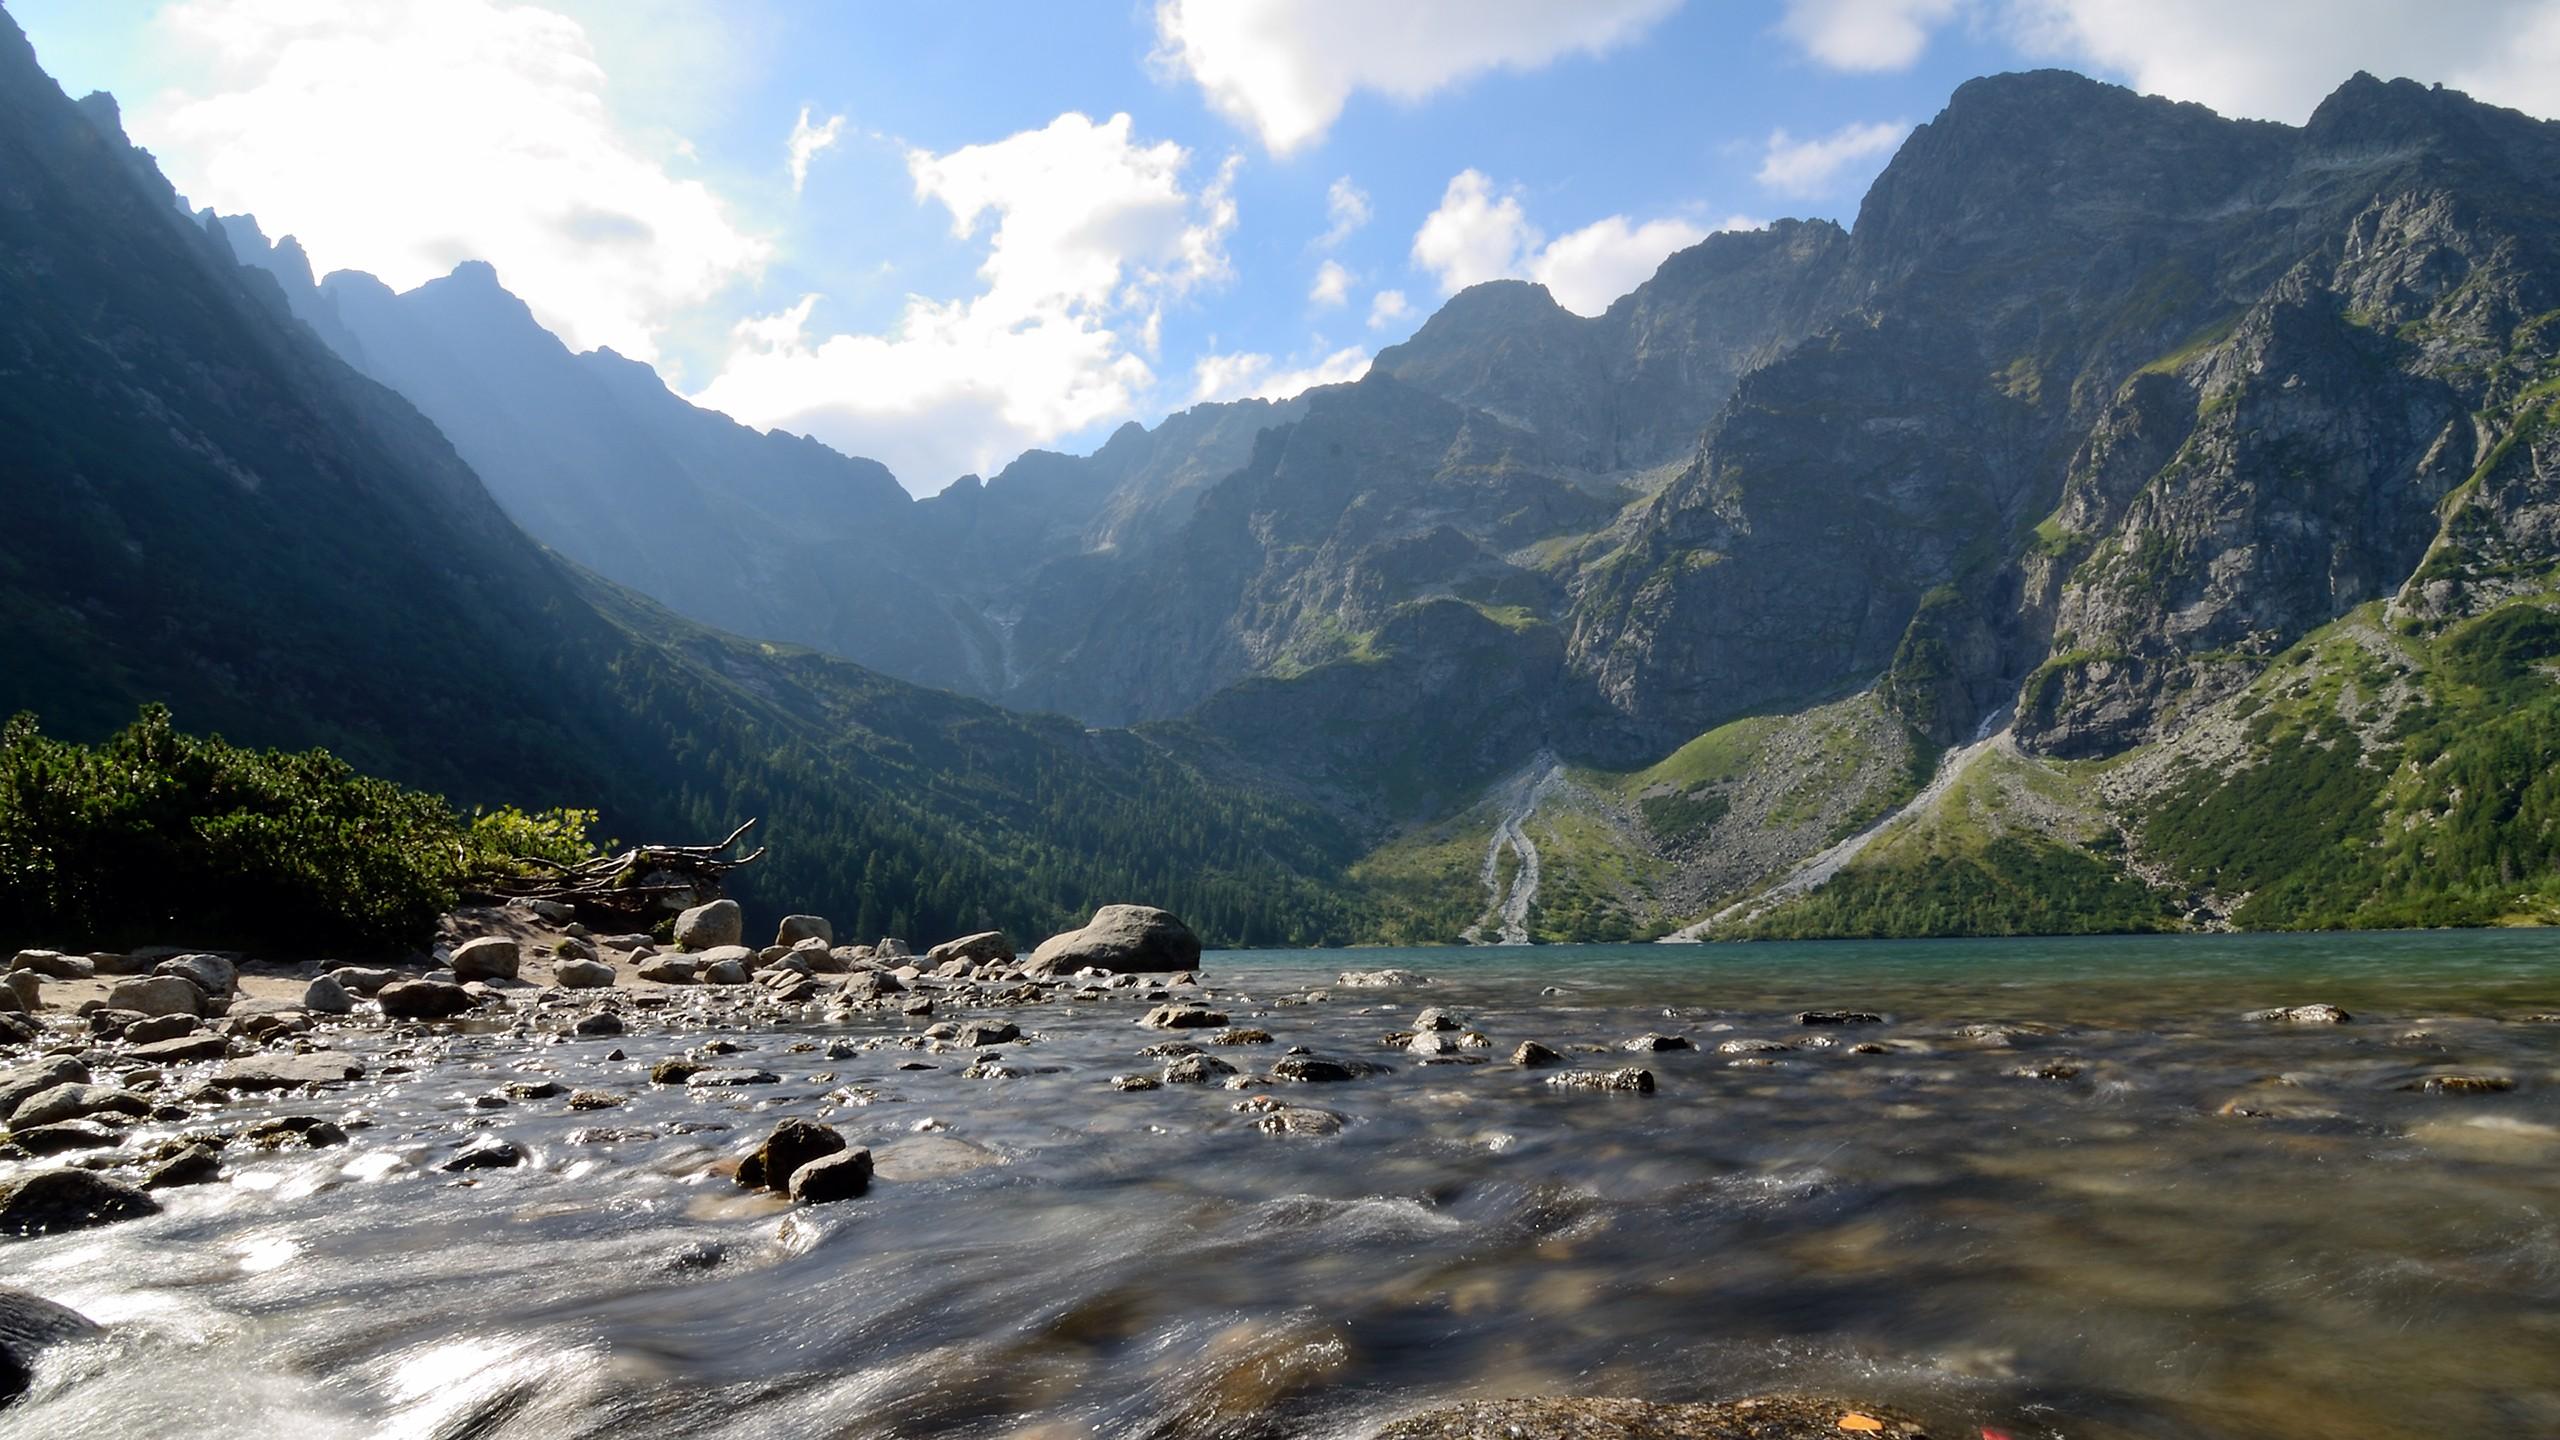 wallpaper 2560x1440 water mountains - photo #4